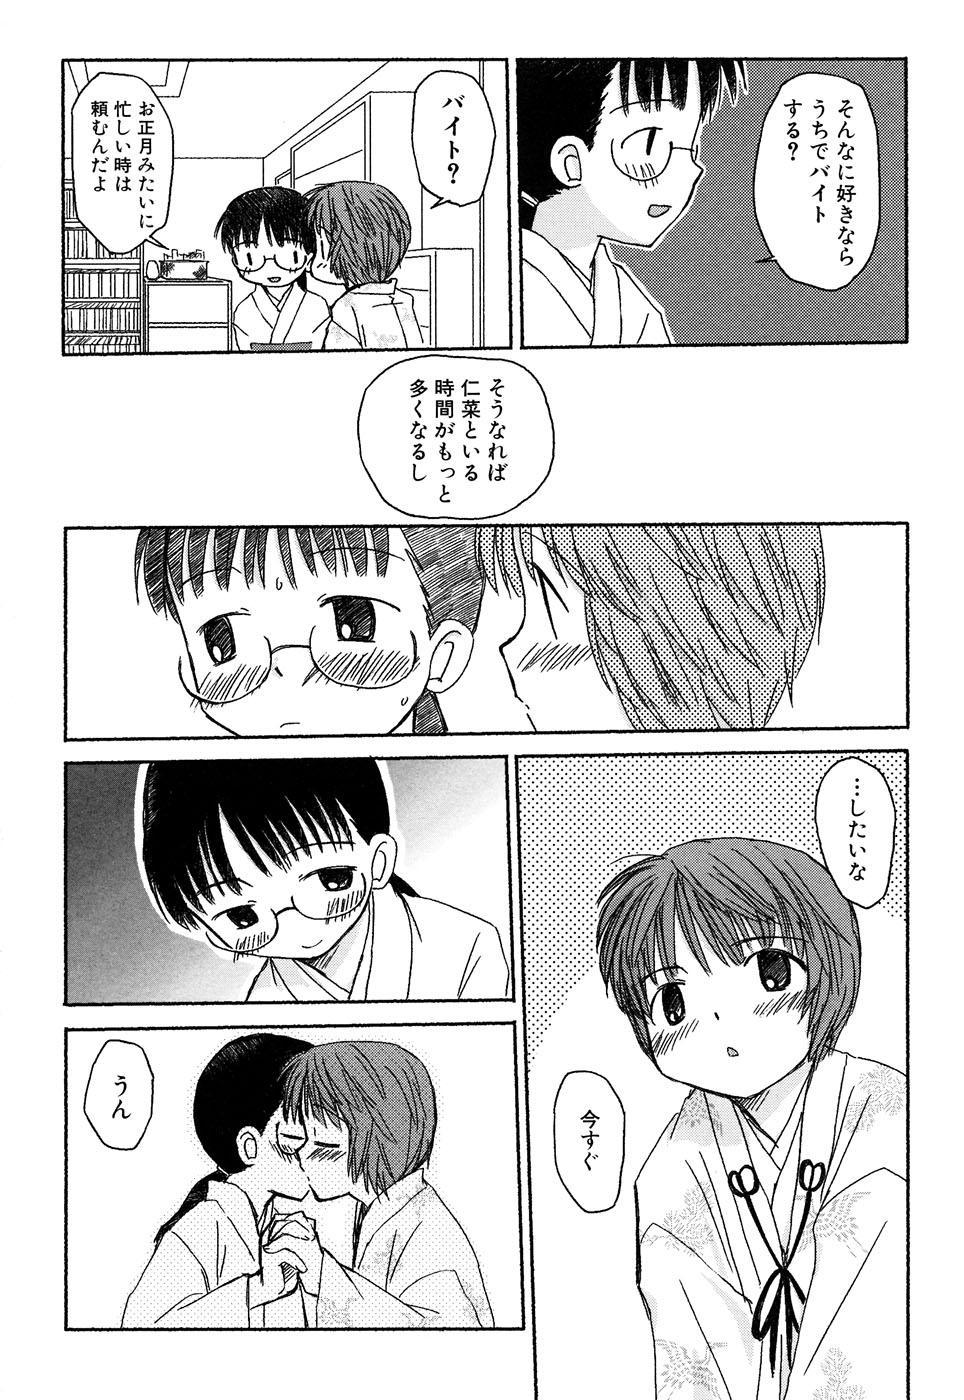 Fechikko VS Series ROUND.2 Miko San VS Maid San 62